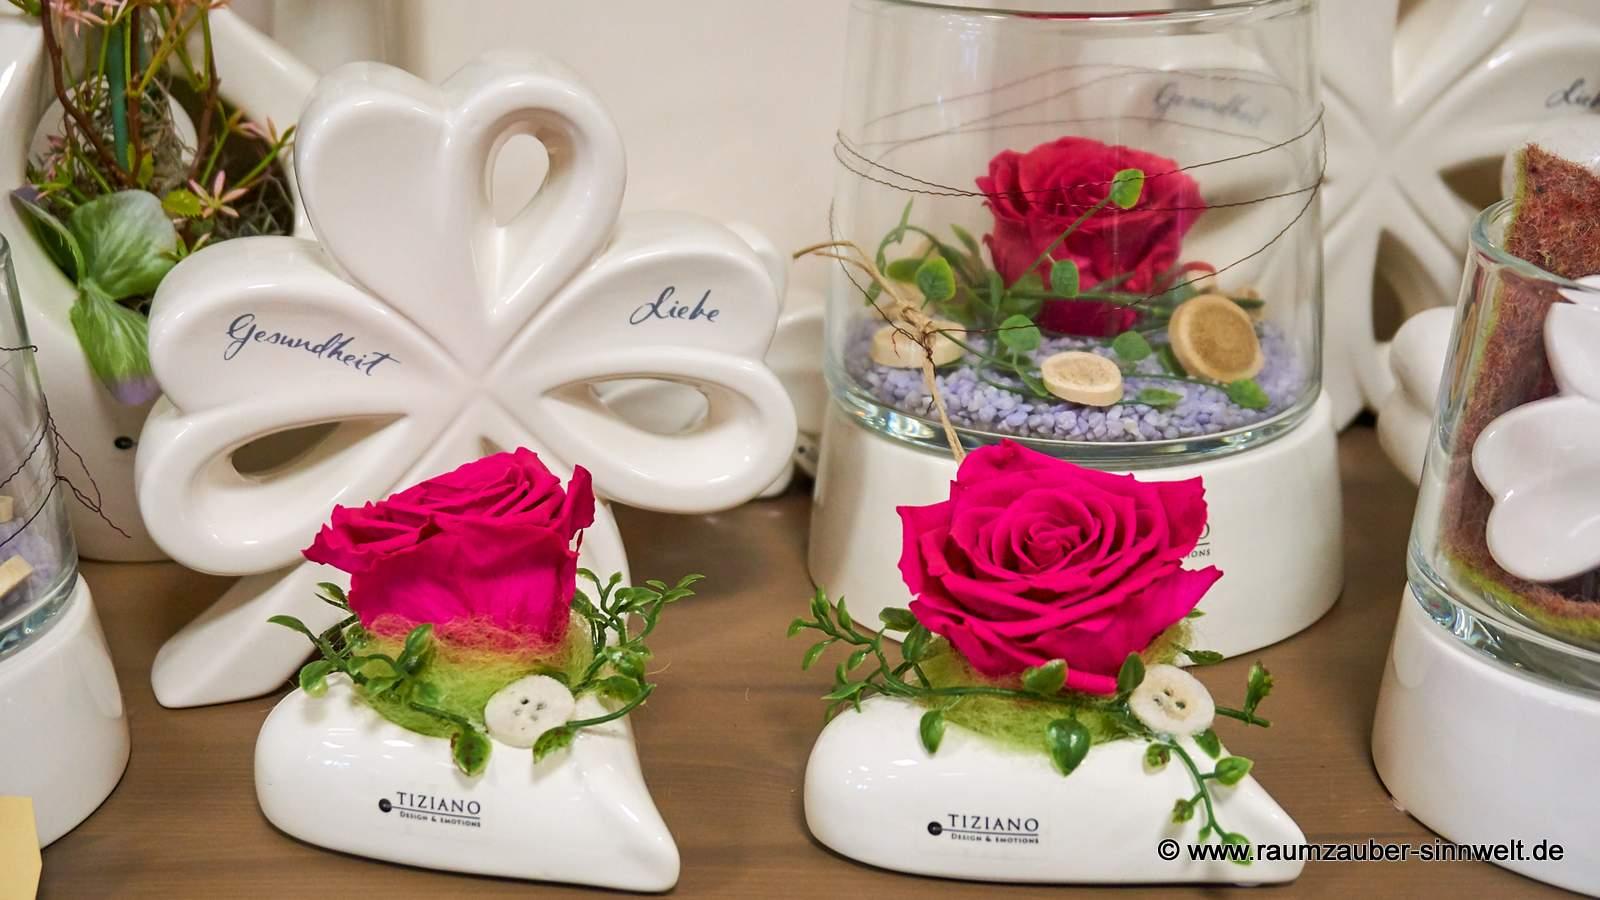 gefriergetrocknete Rosen in TIZIANO - Herz Belvina